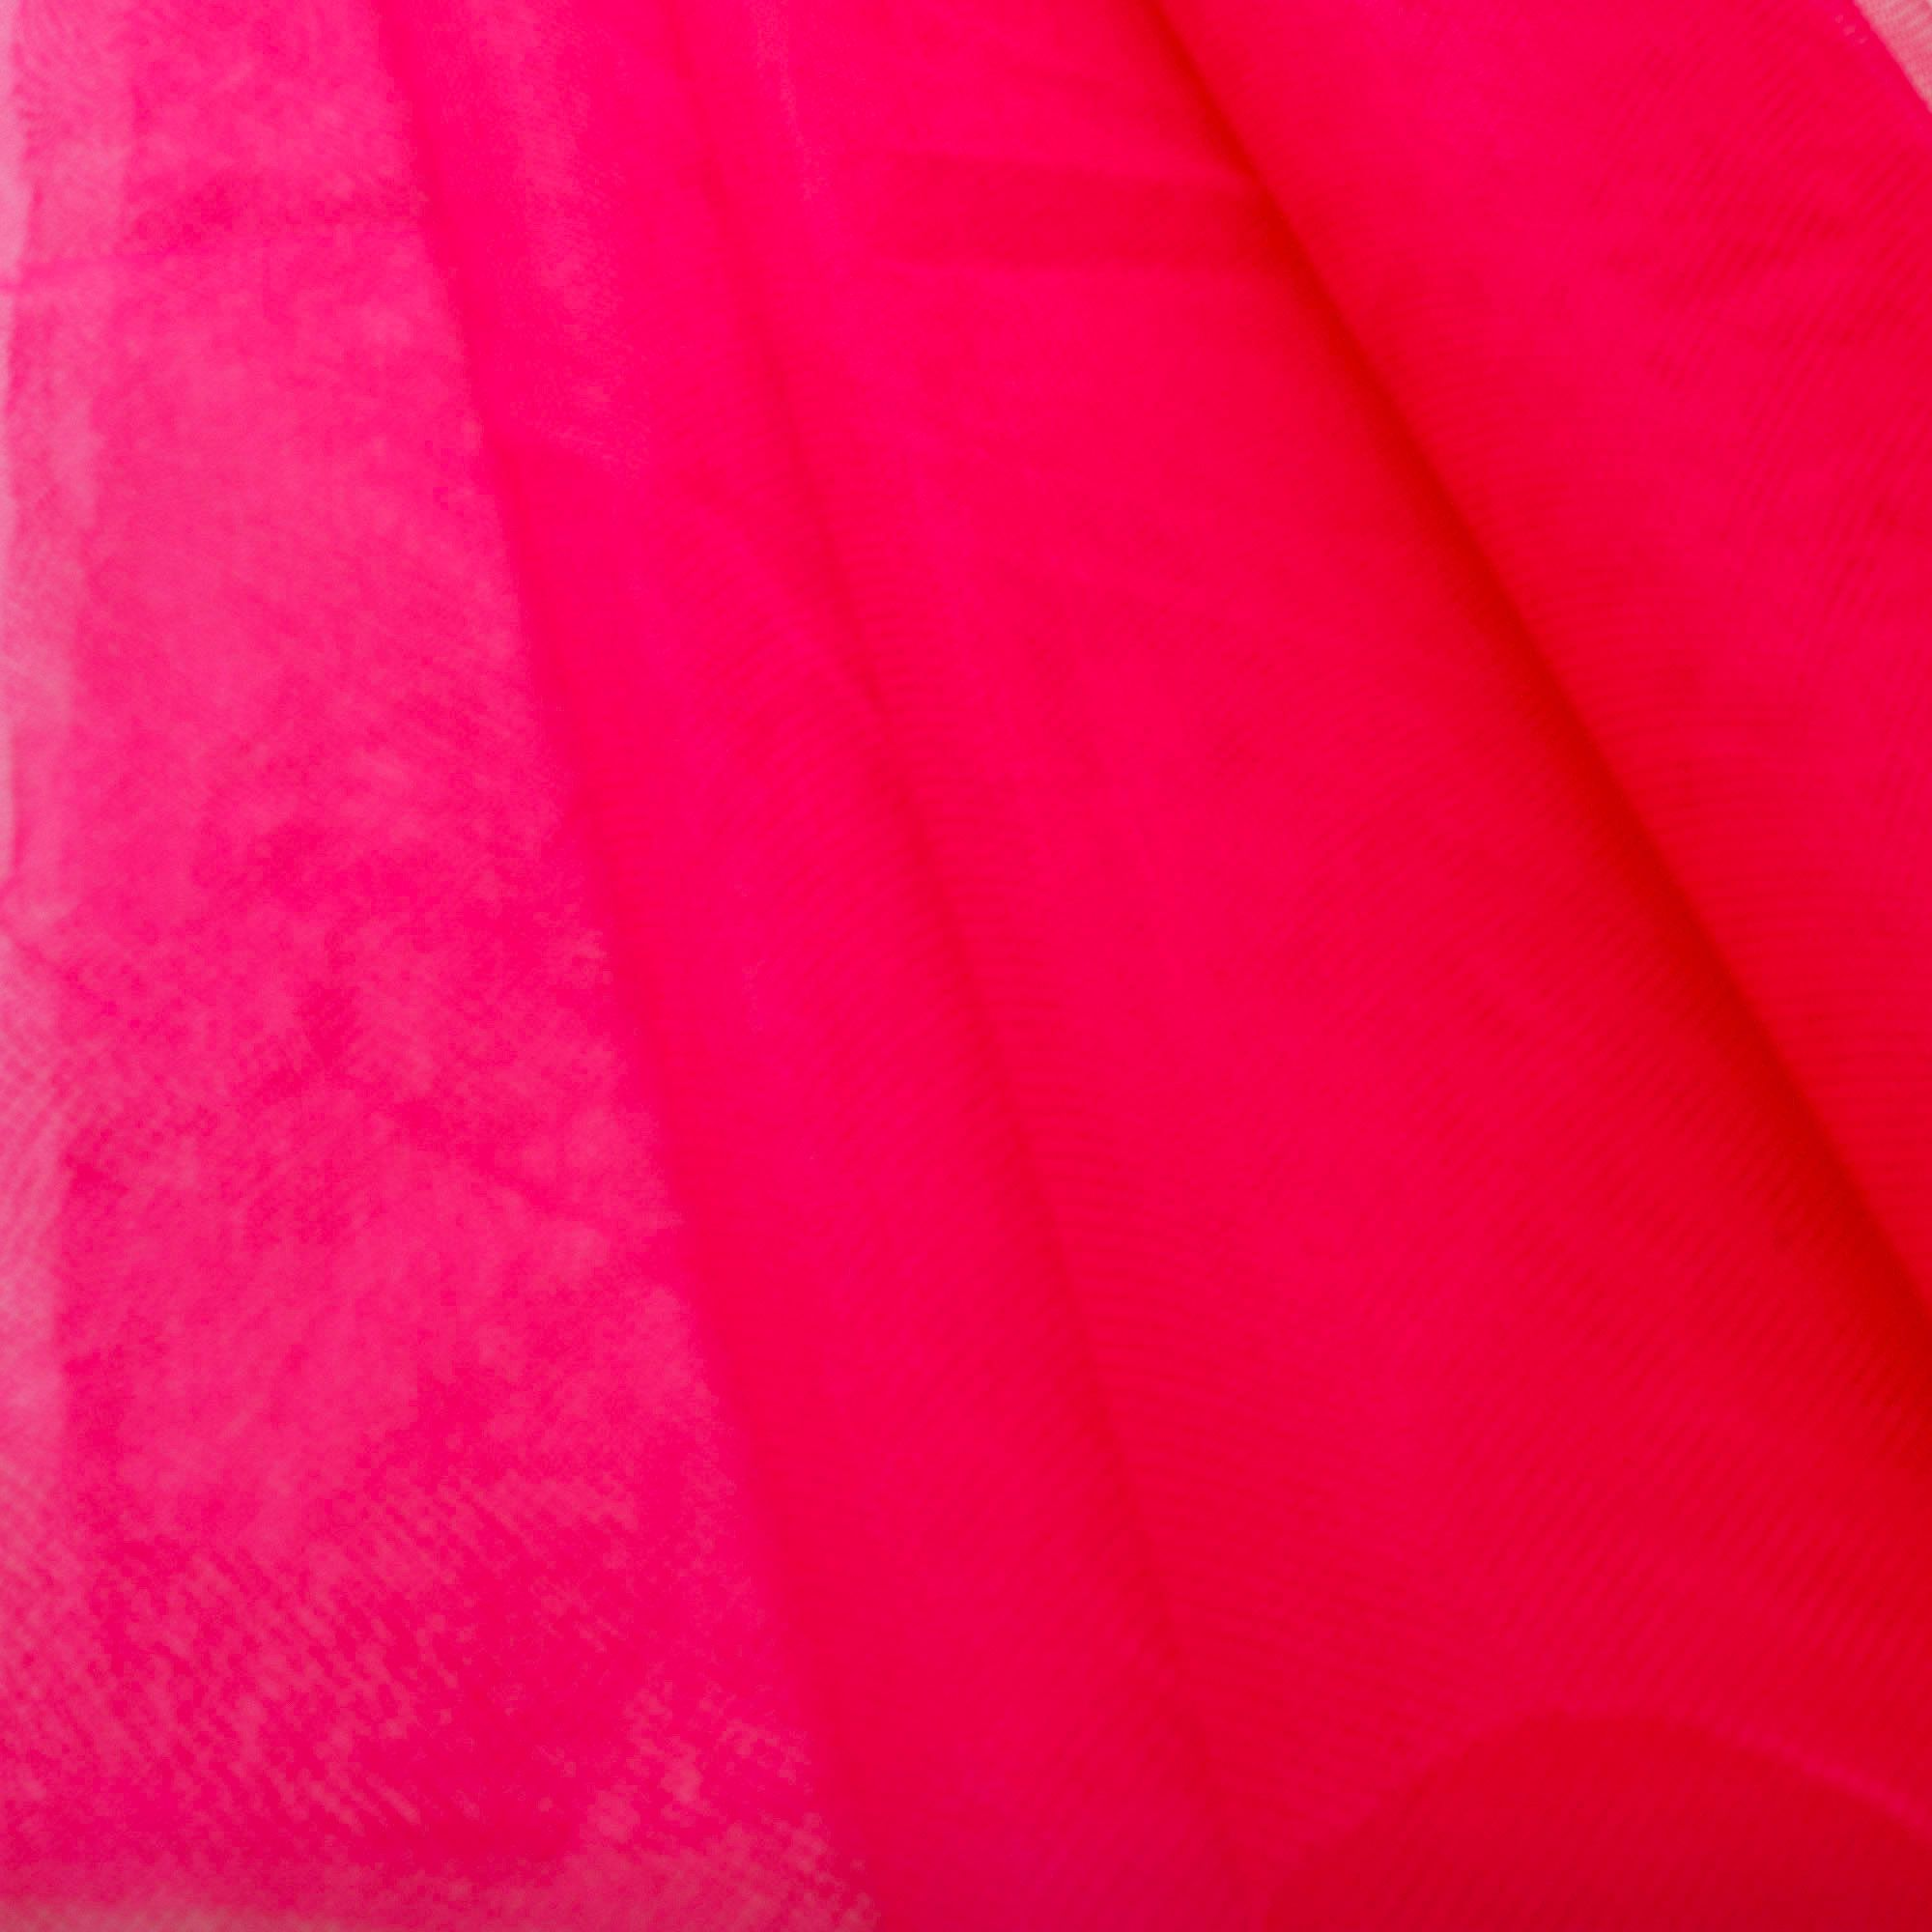 Tecido Filó Rosa Pink 100% Poliamida 3 m Largura